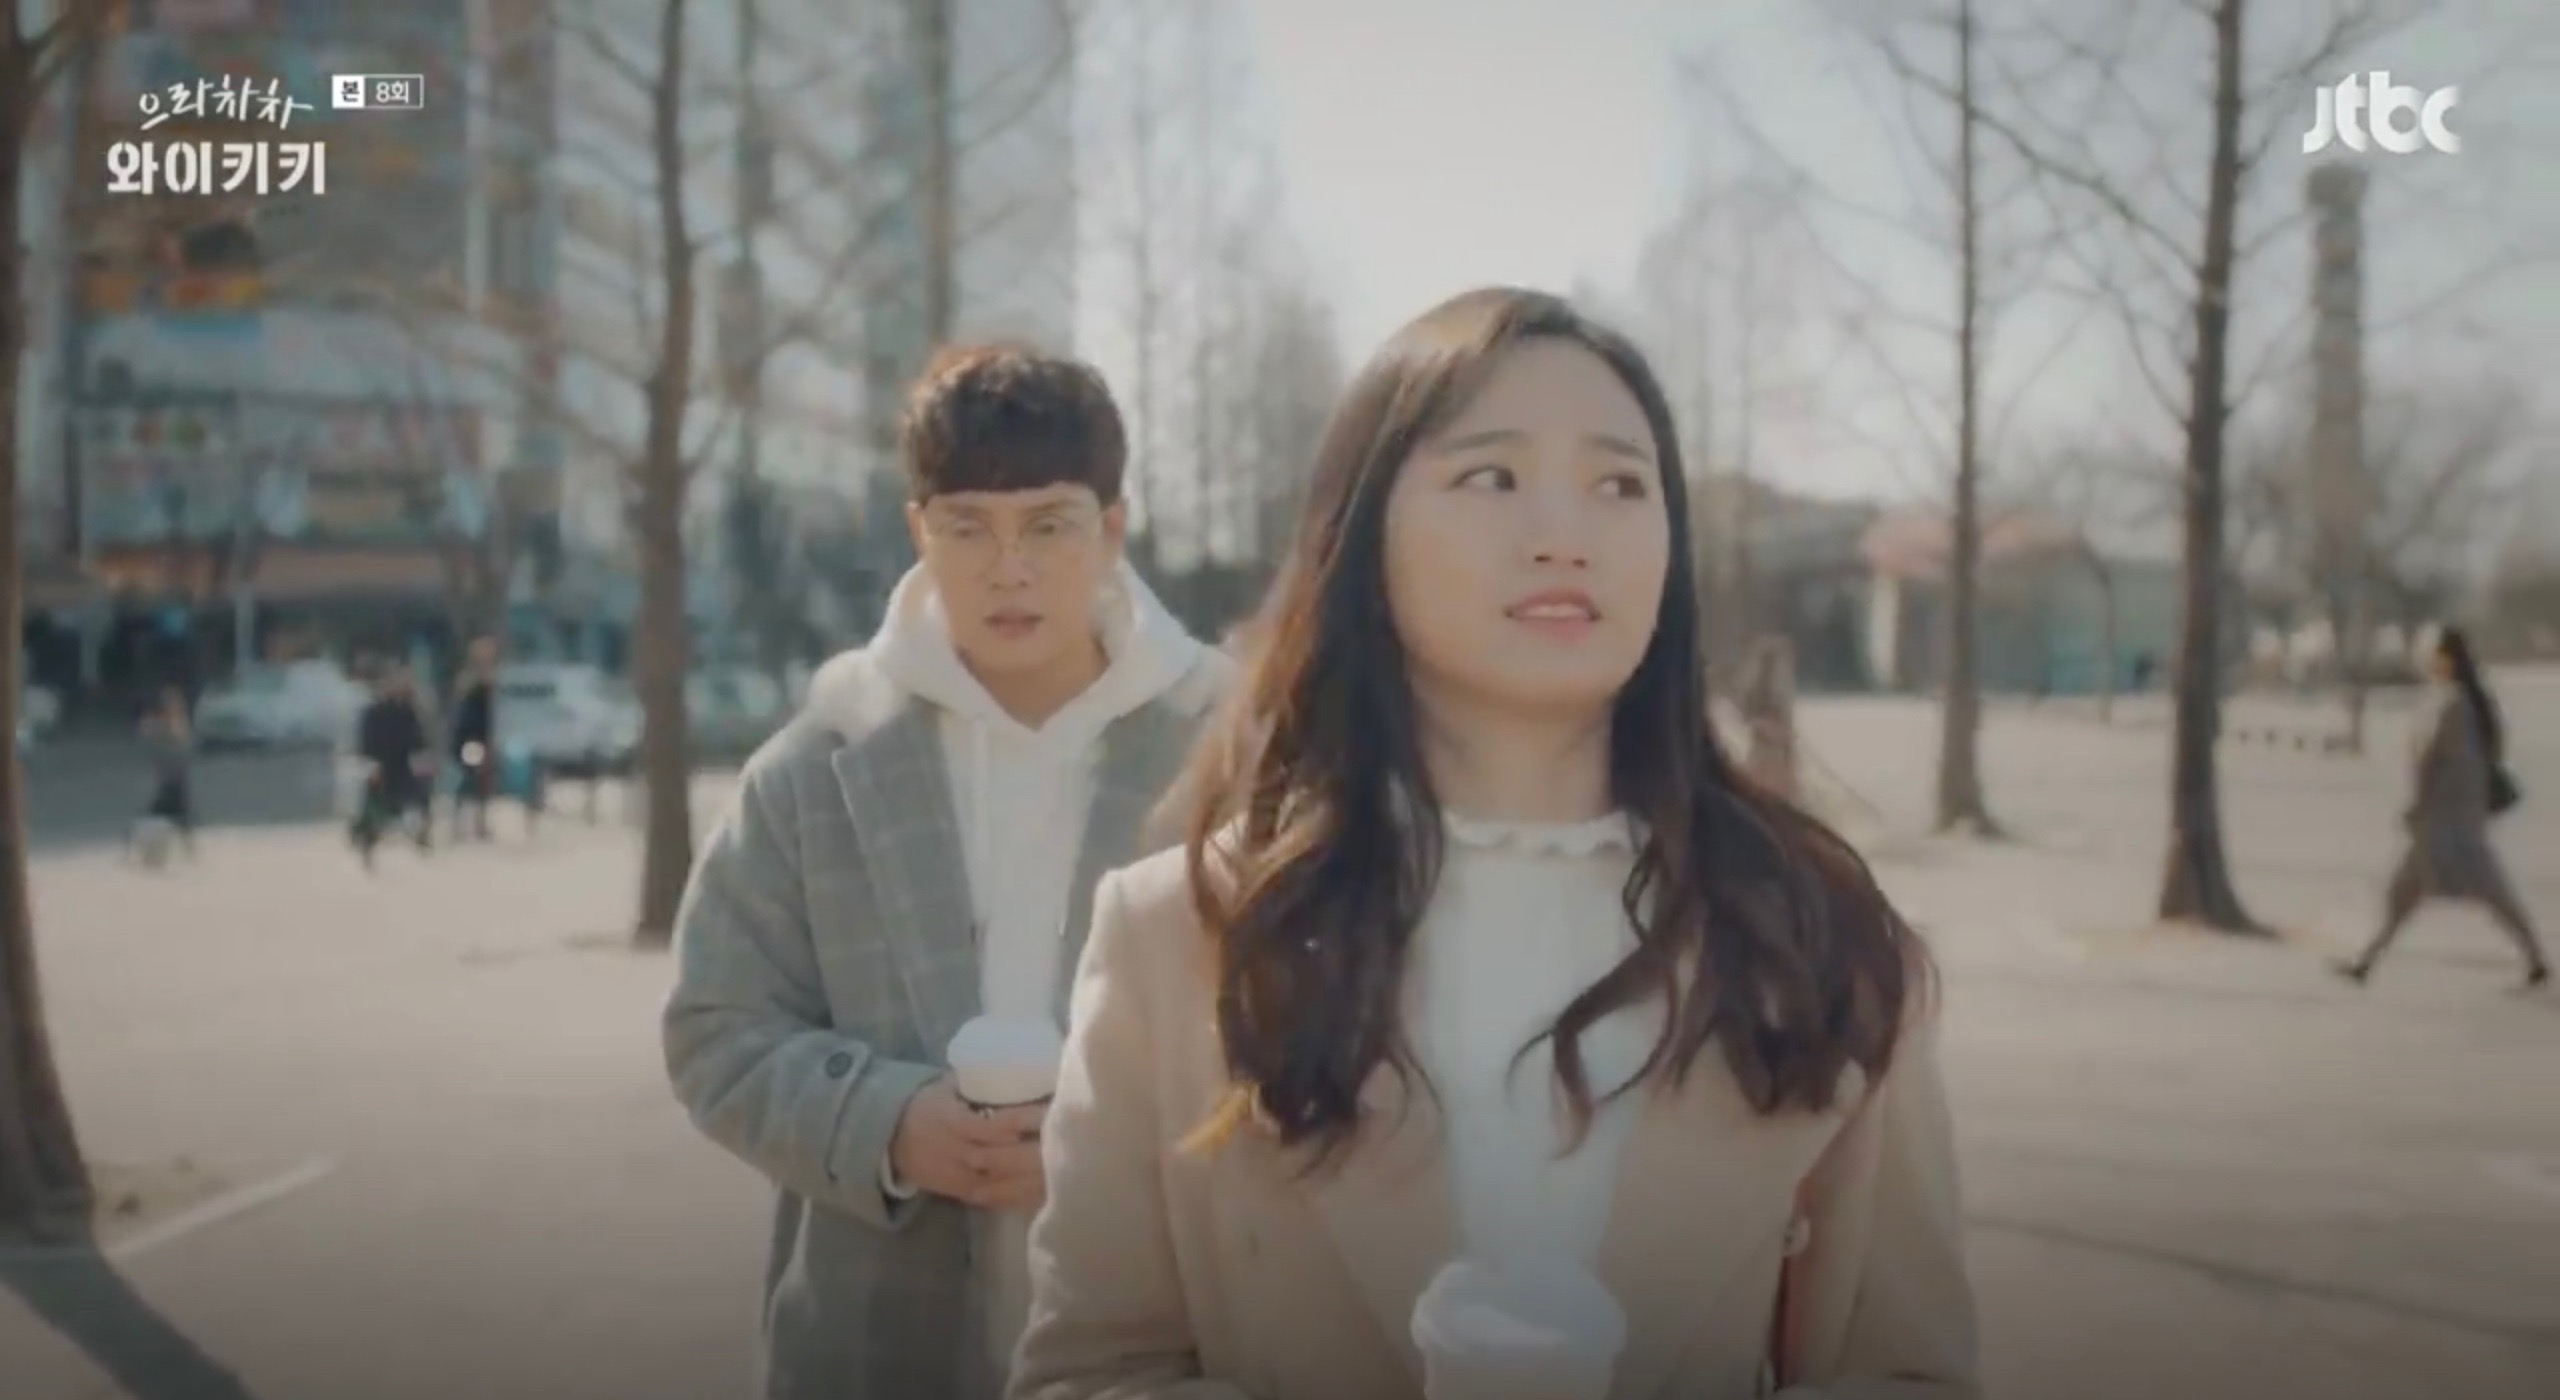 Son Seung Won: Ilsan Cultural Park [일산문화공원]